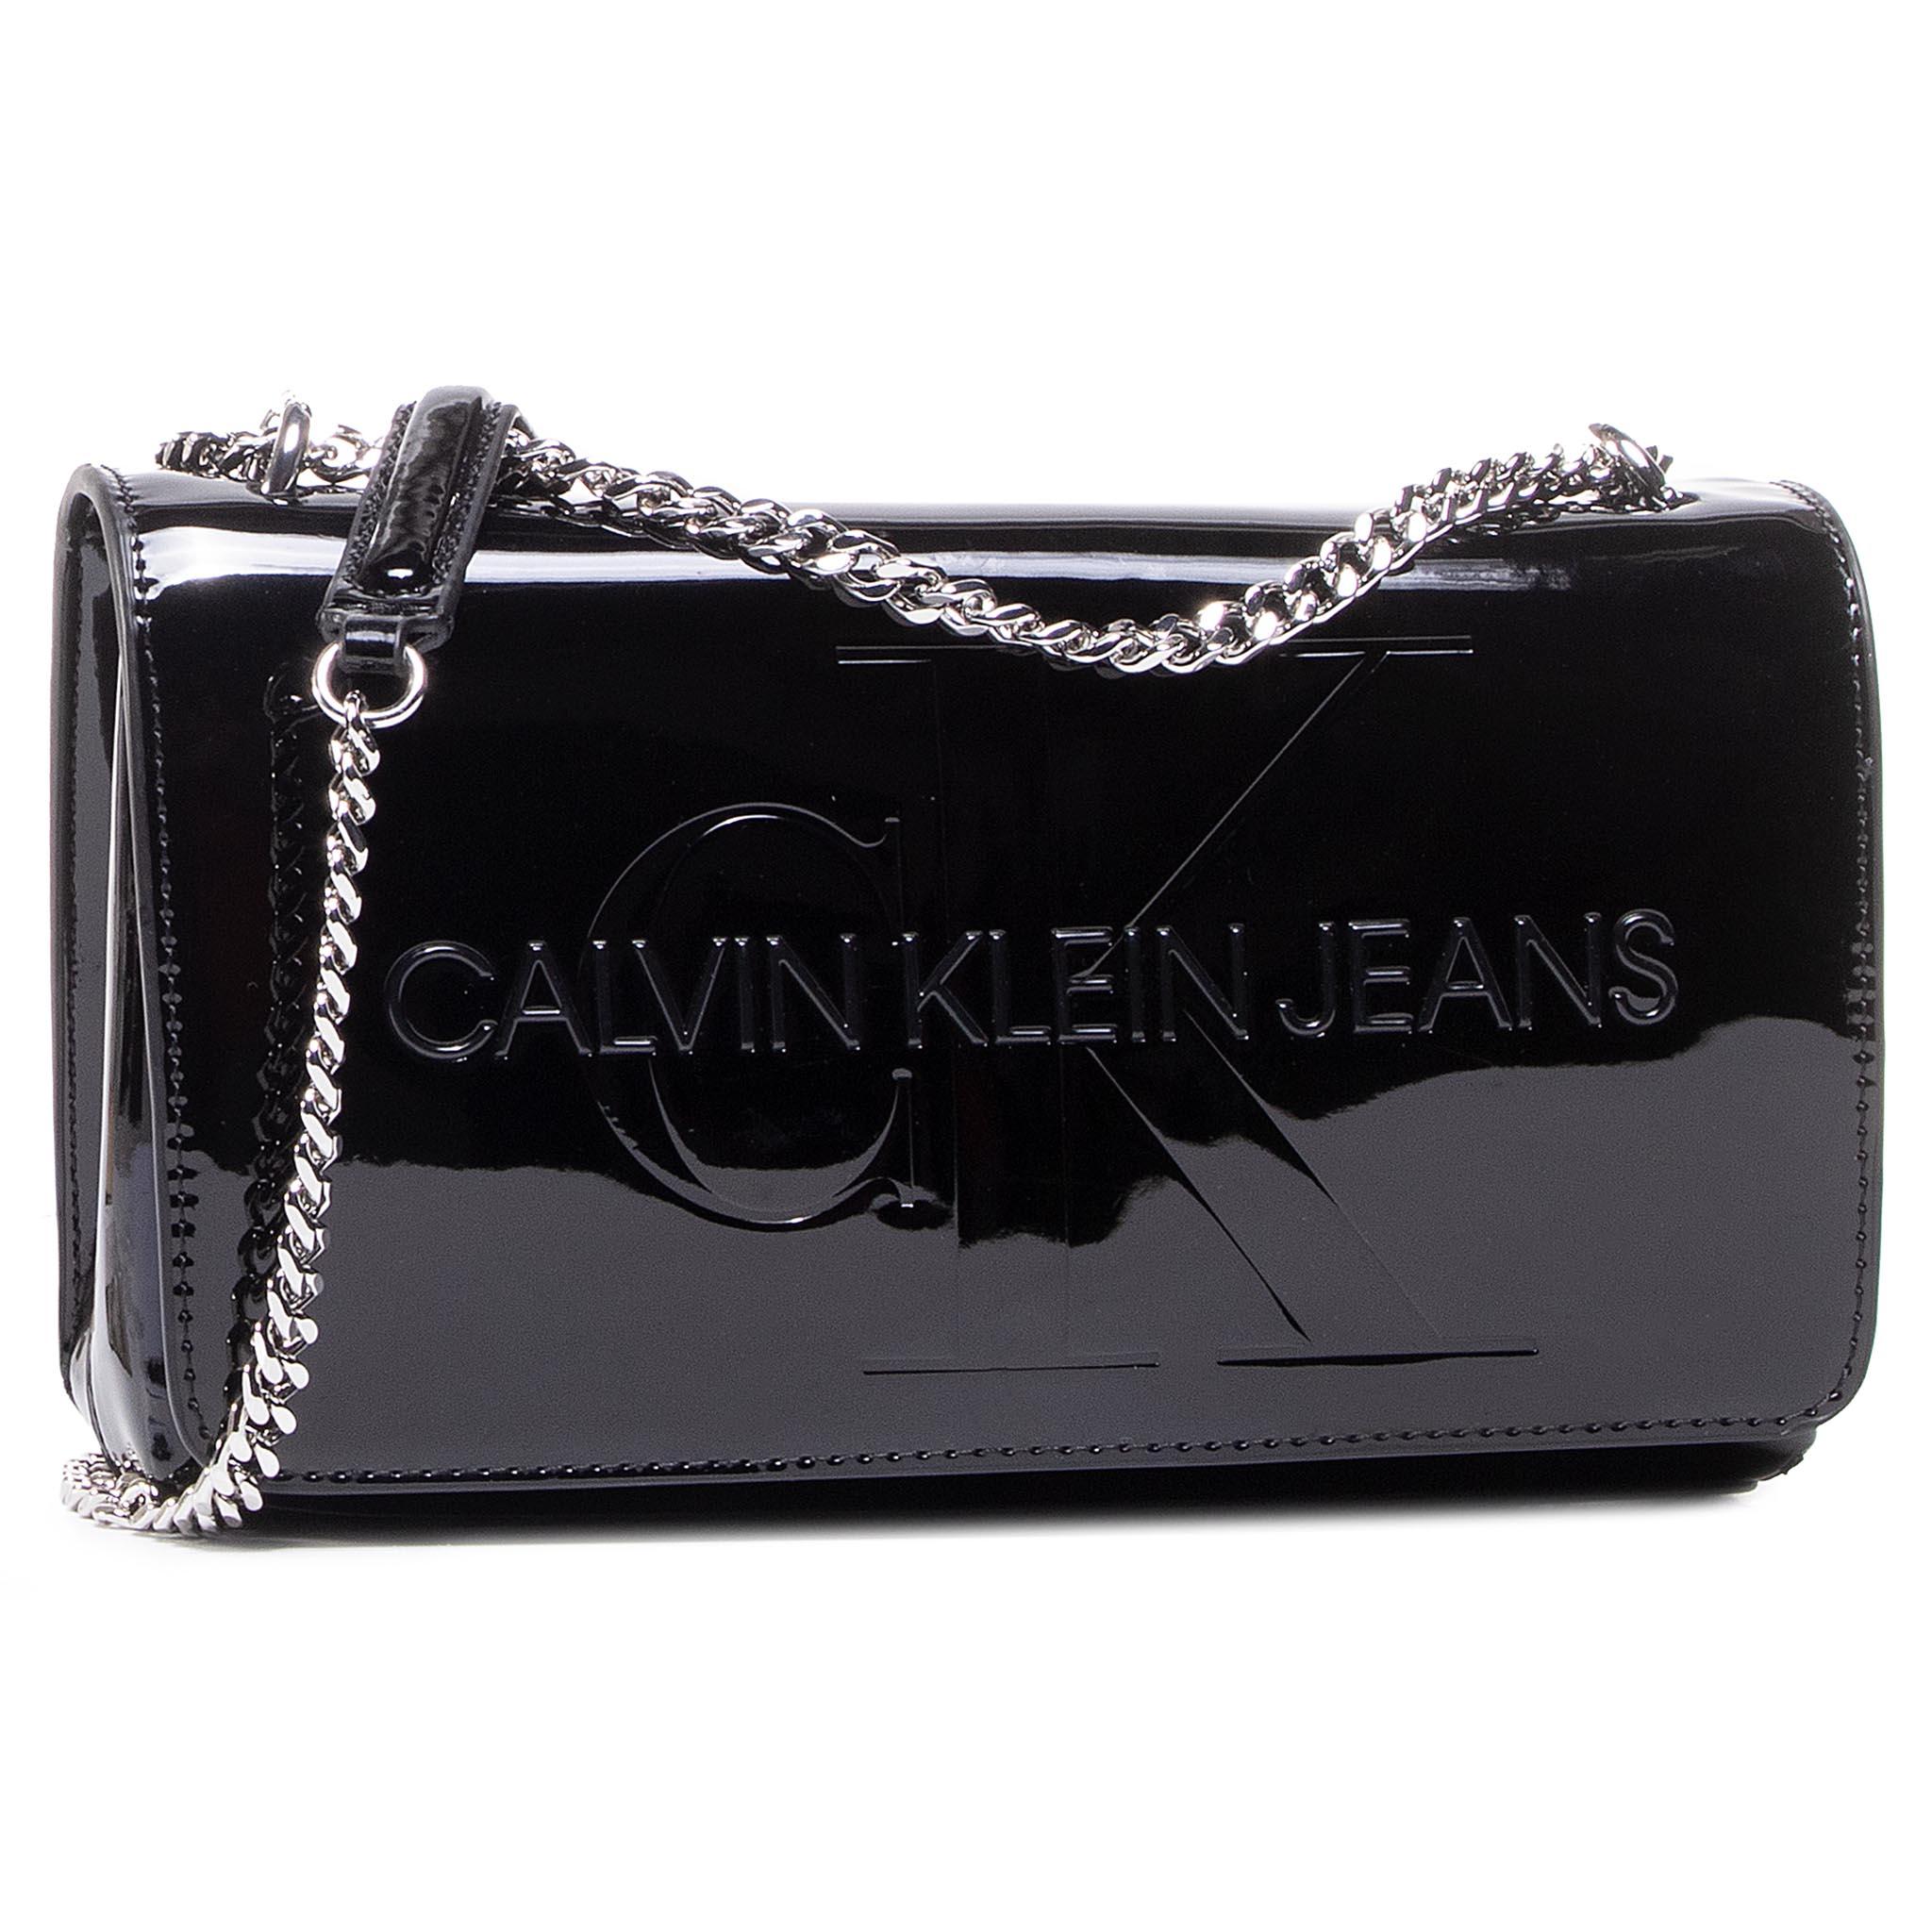 Image of Handtasche CALVIN KLEIN JEANS - Convertible Ew Flap Patent K60K607622 Black BDS